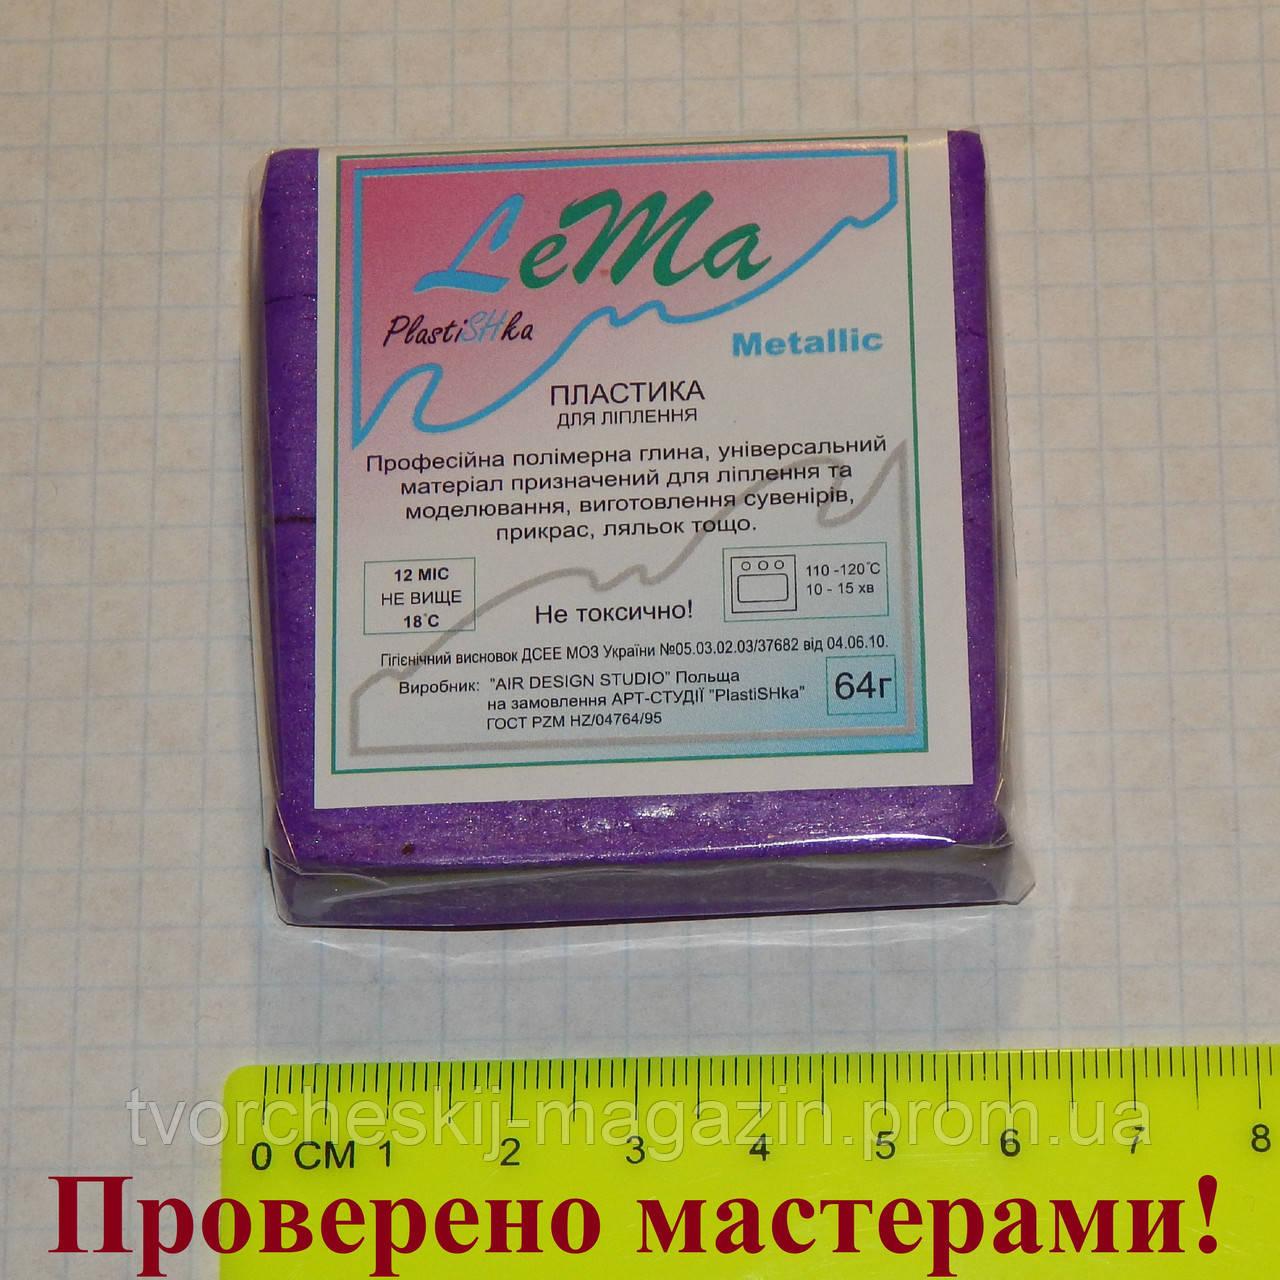 "Пластика ""LEMA"" Metallic фіолетовий металік (фиолетовый металлик), 64 г"